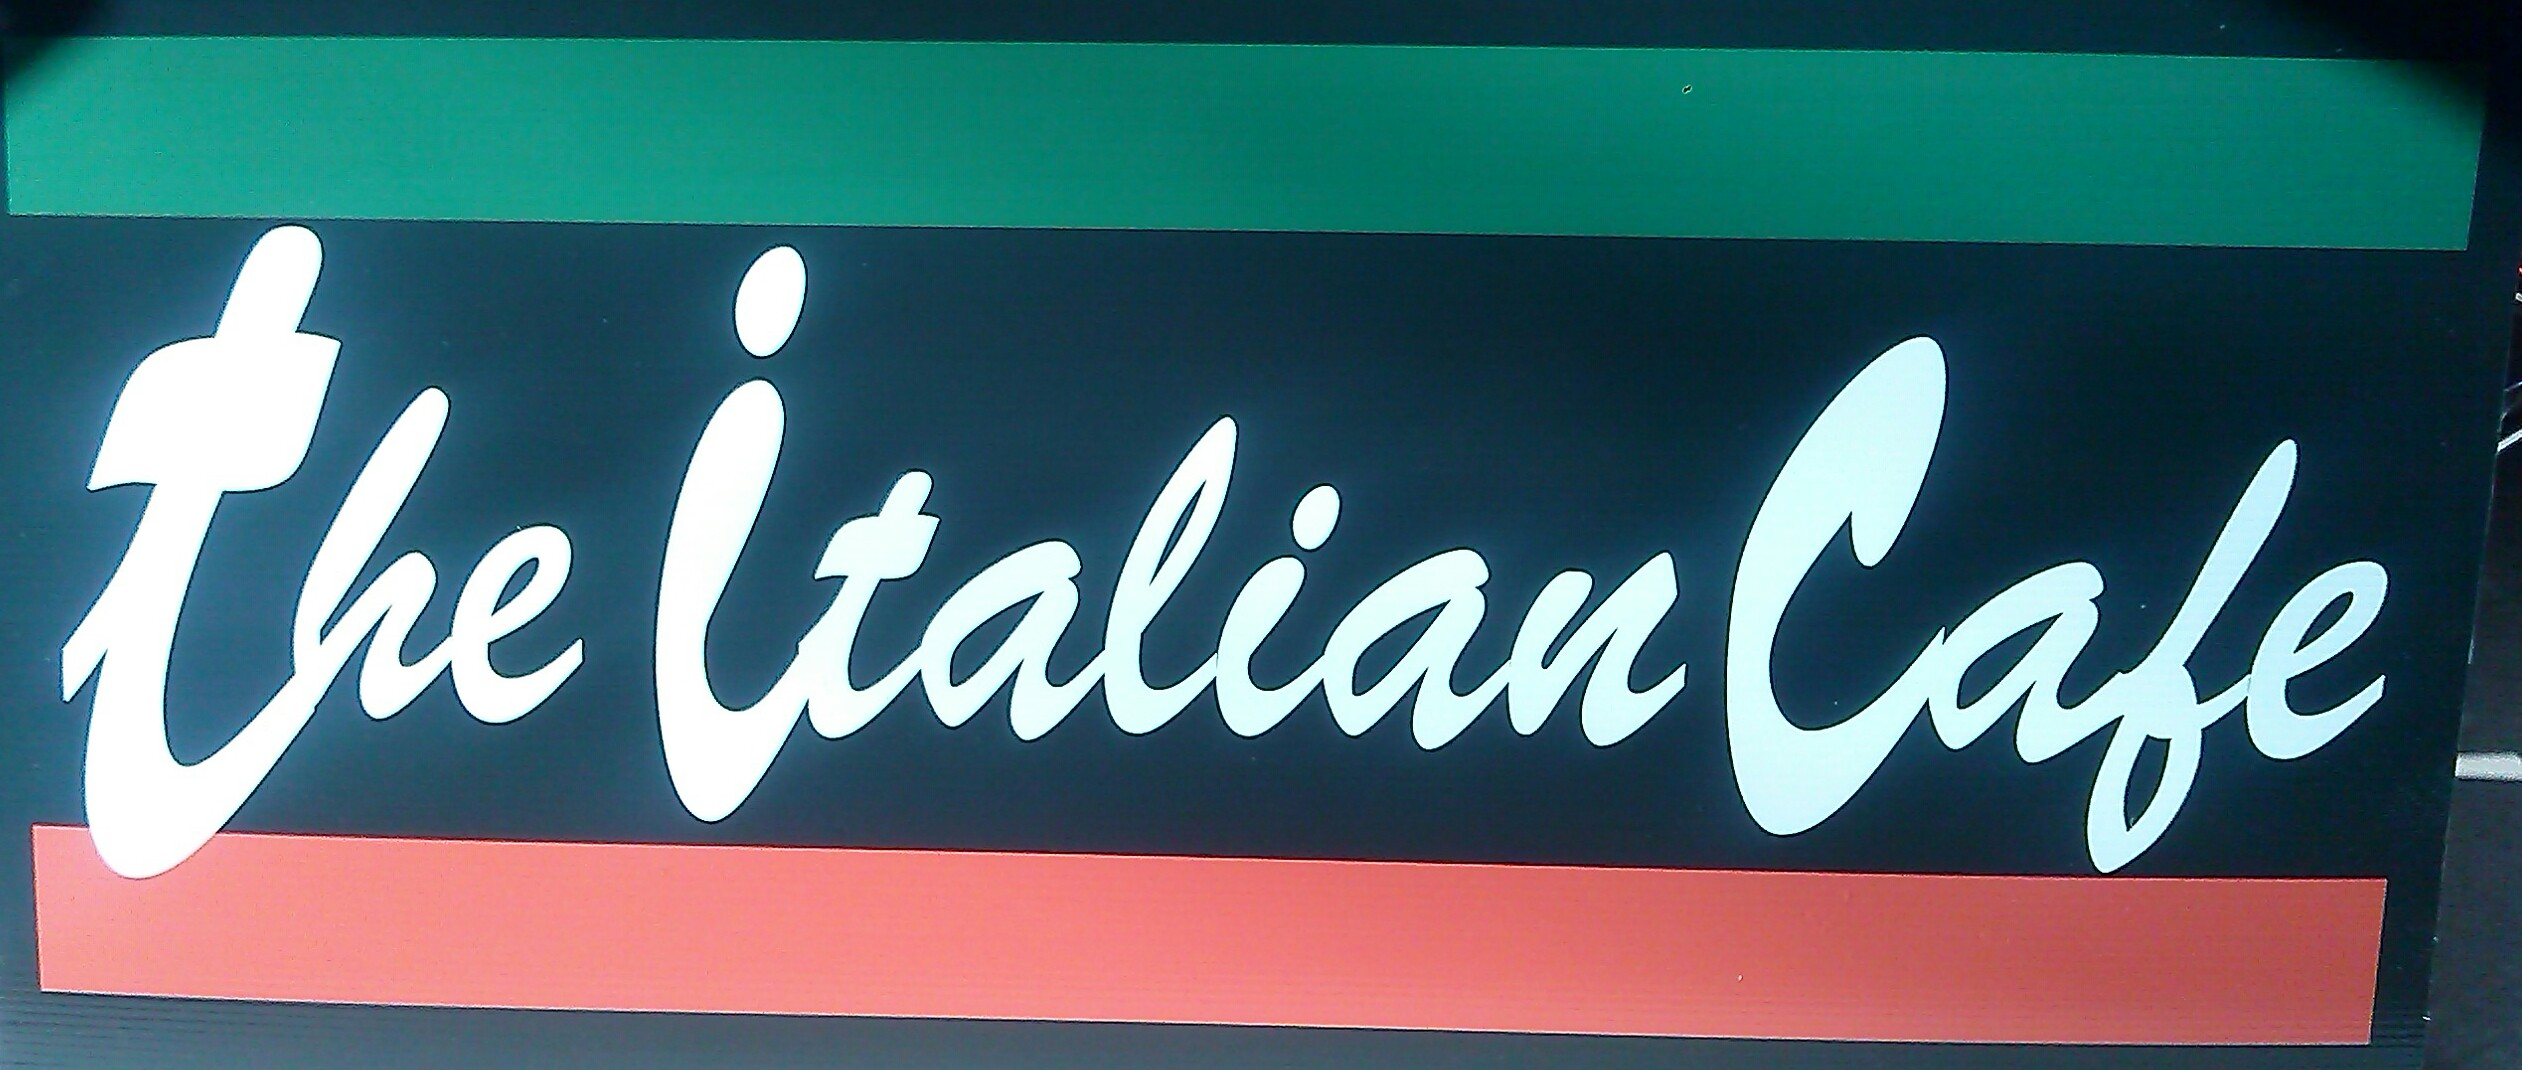 The Italian Cafe, Childersburg AL